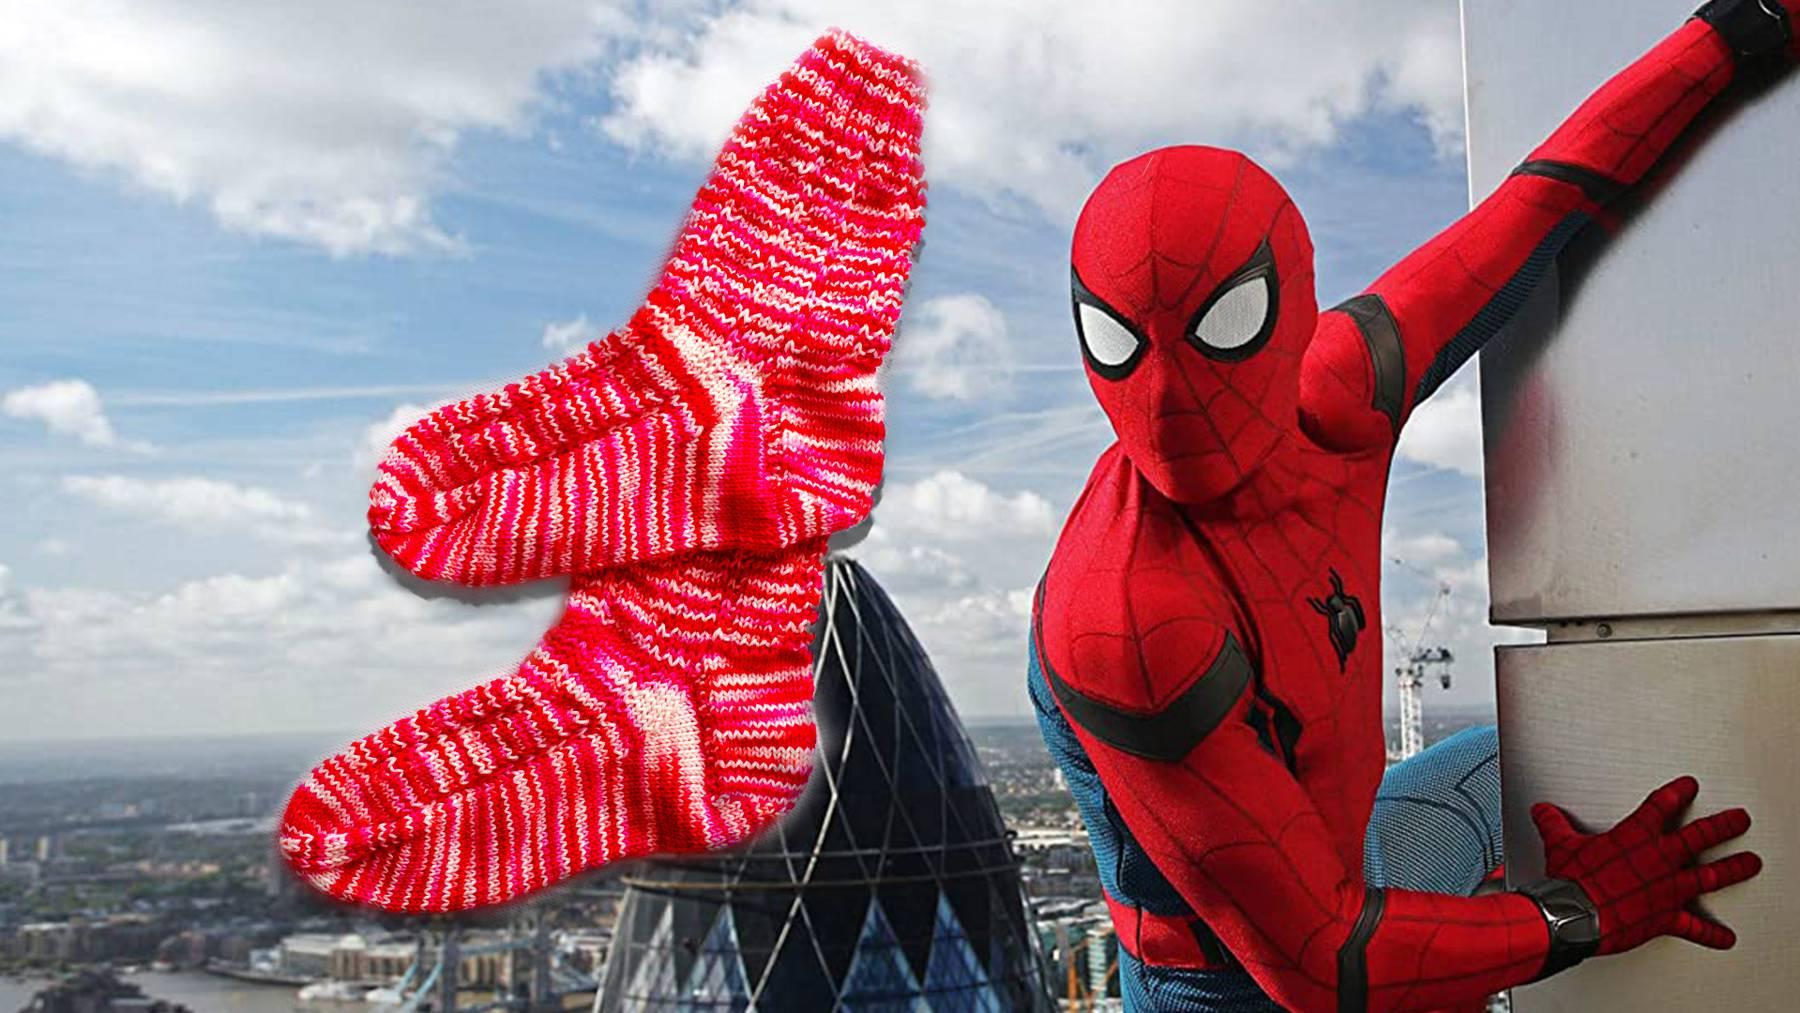 210825_Spiderman_wan